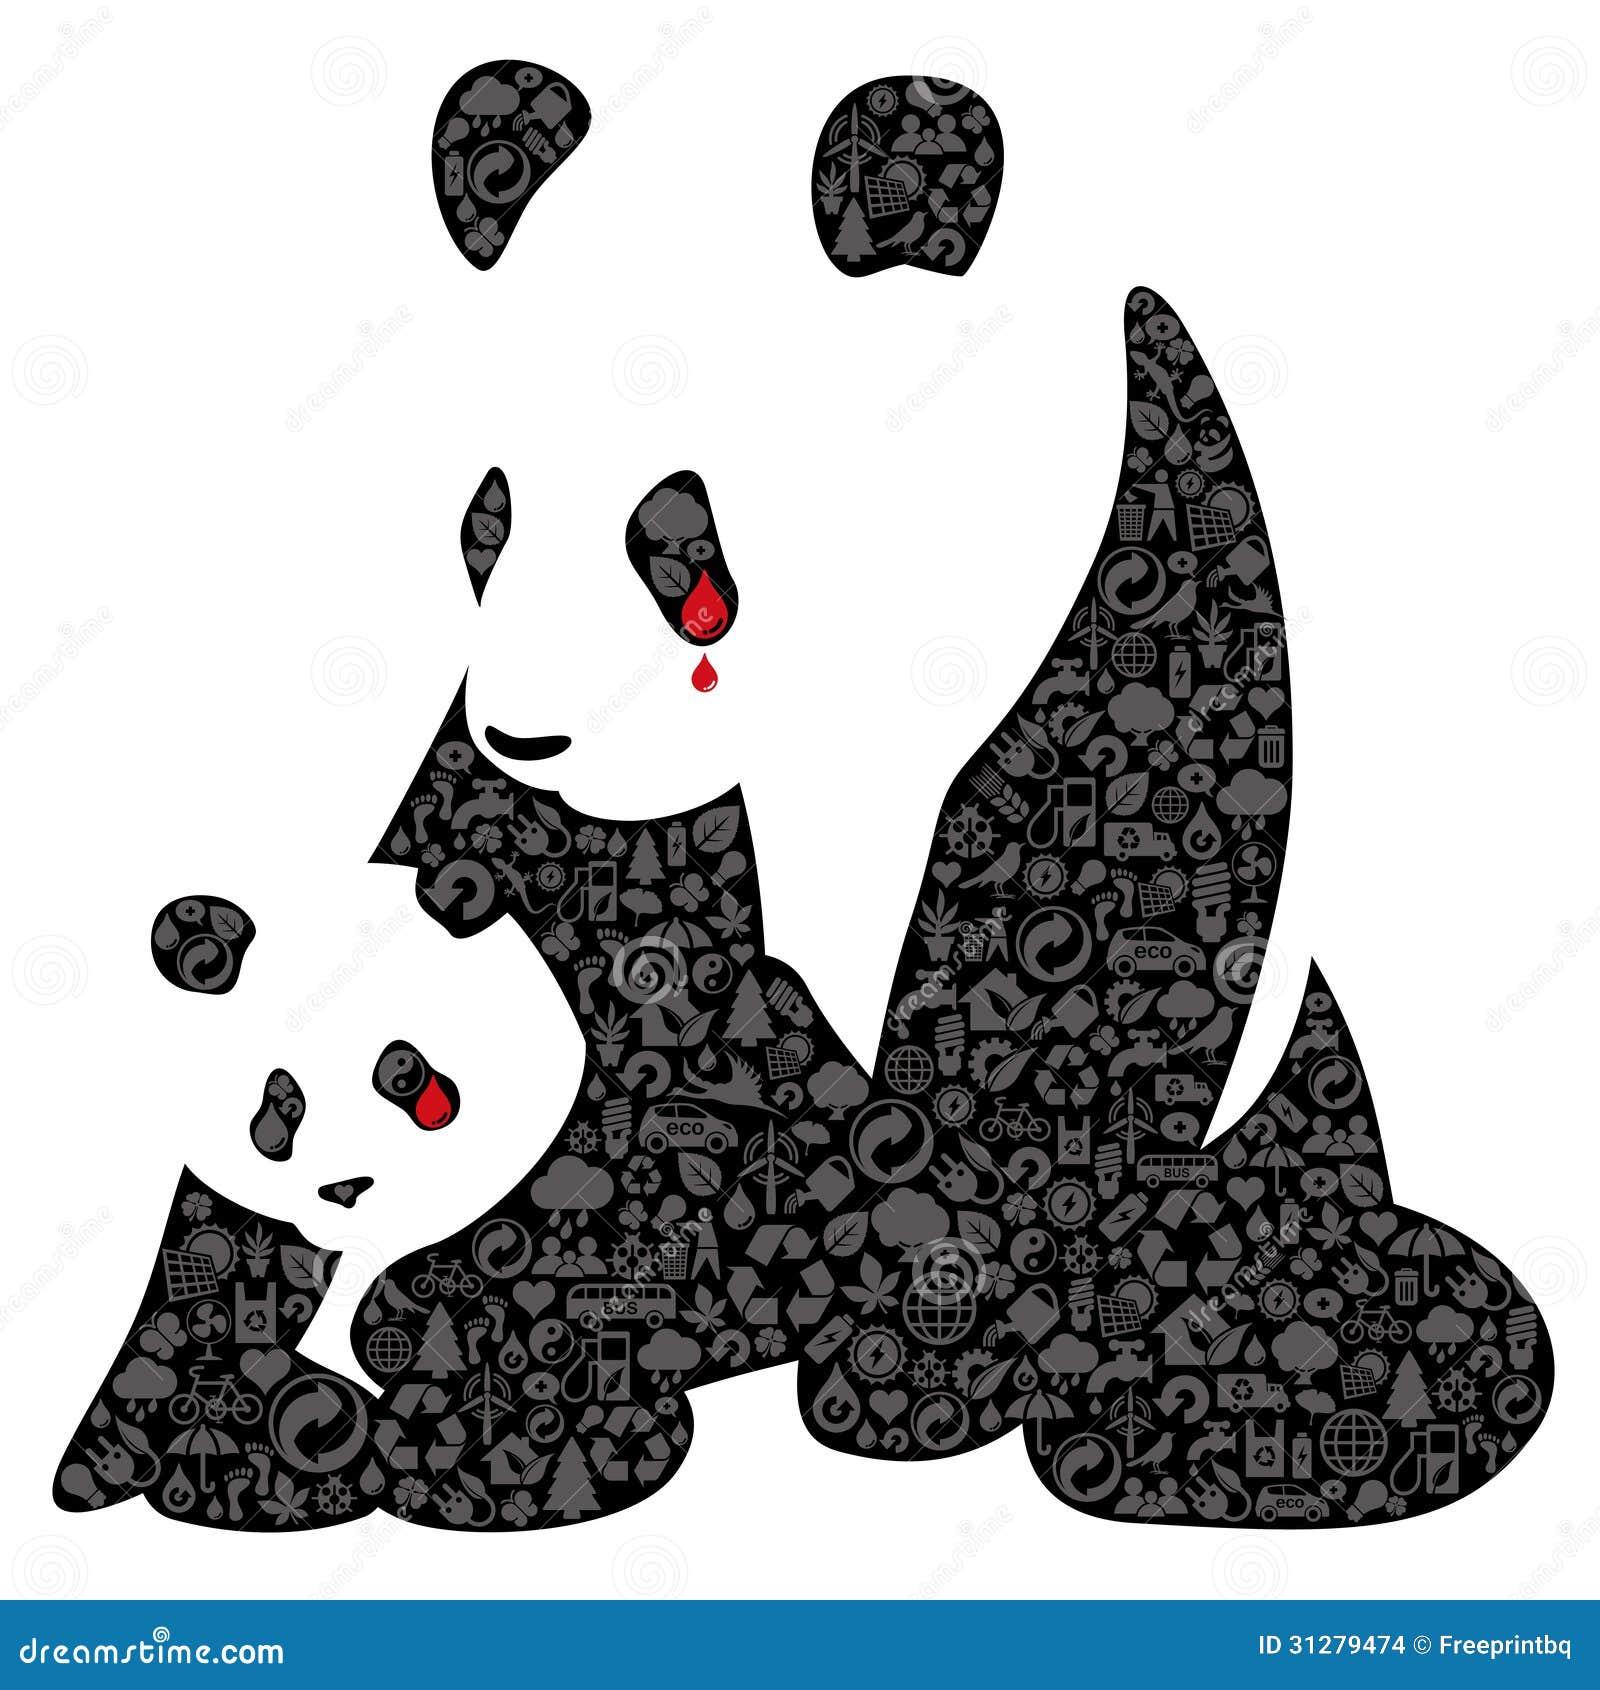 China panda made of ecology icons